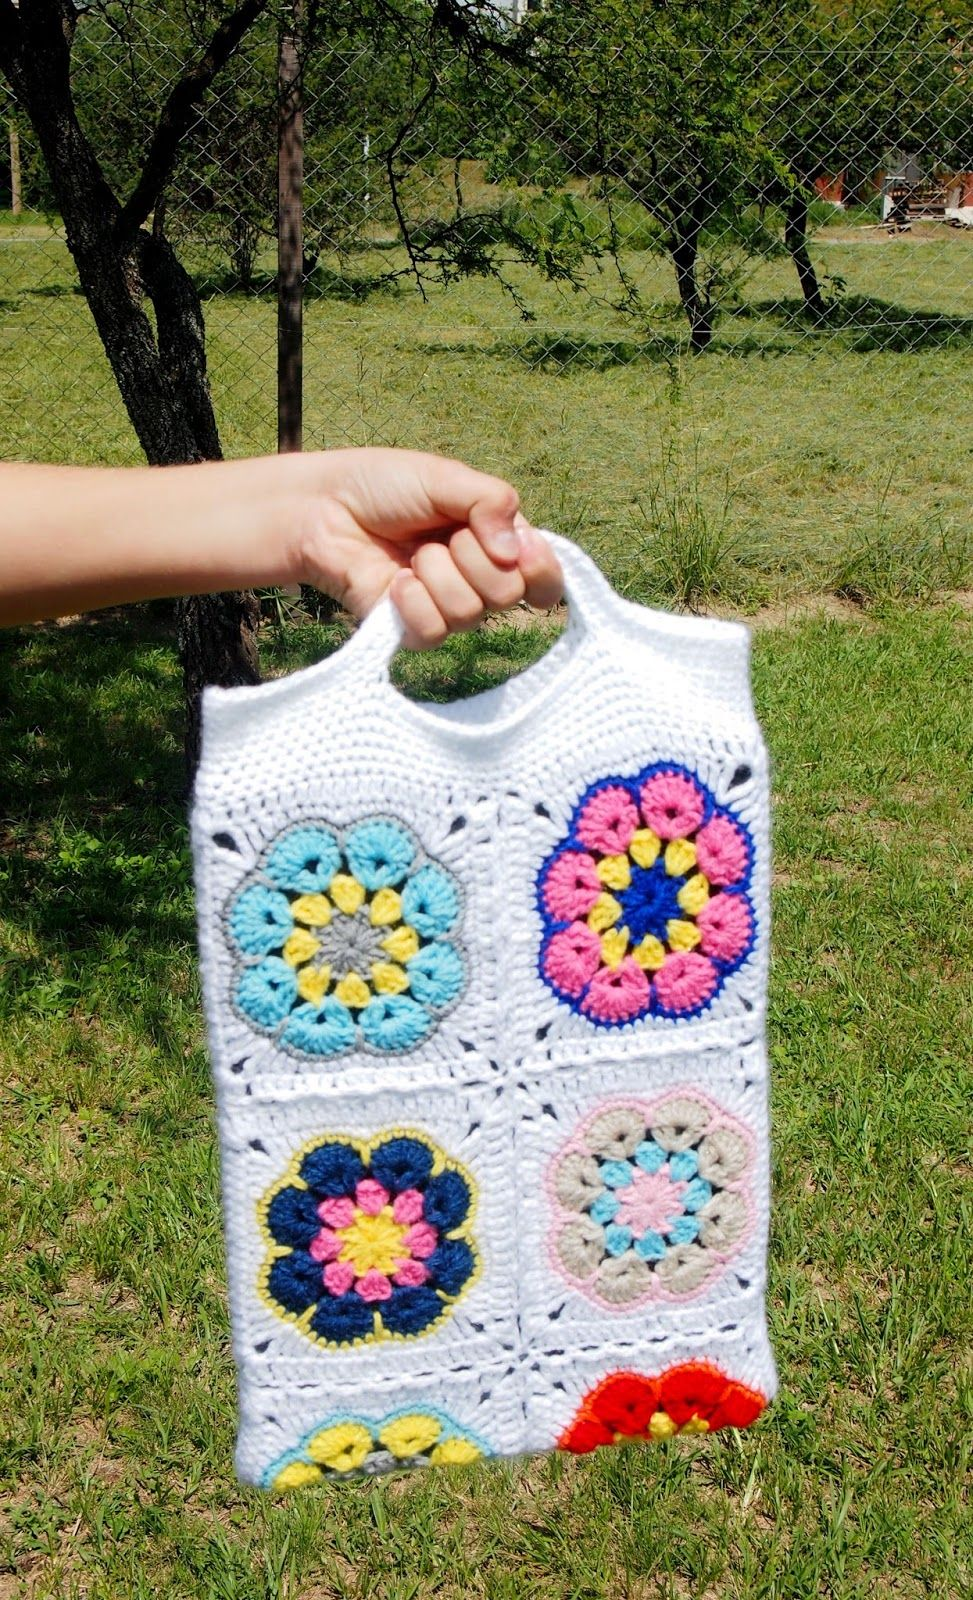 Sol de Noche {deco crochet}: How to crochet a Laptop Case   Crochet ...